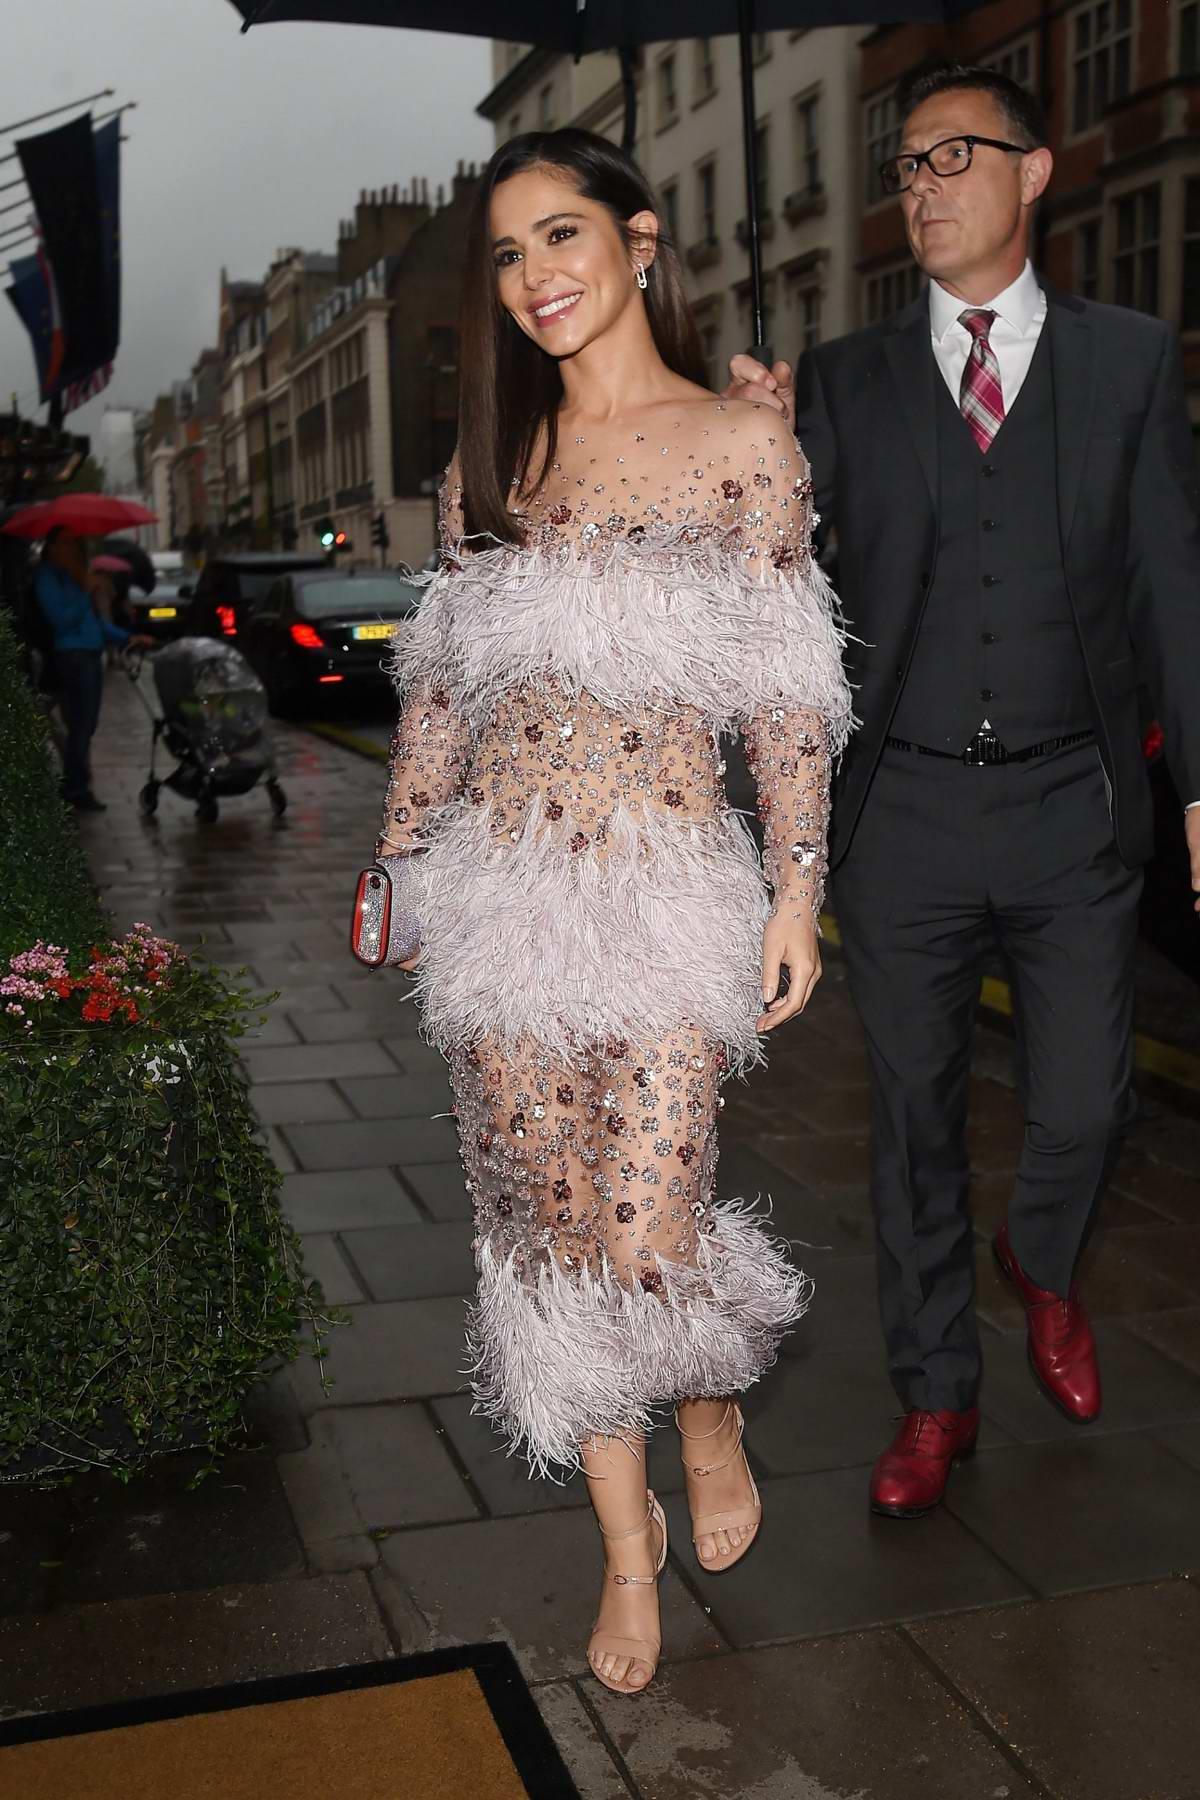 Cheryl Tweedy arrives at Nigel Hall's wedding at Claridges Hotel in London, UK